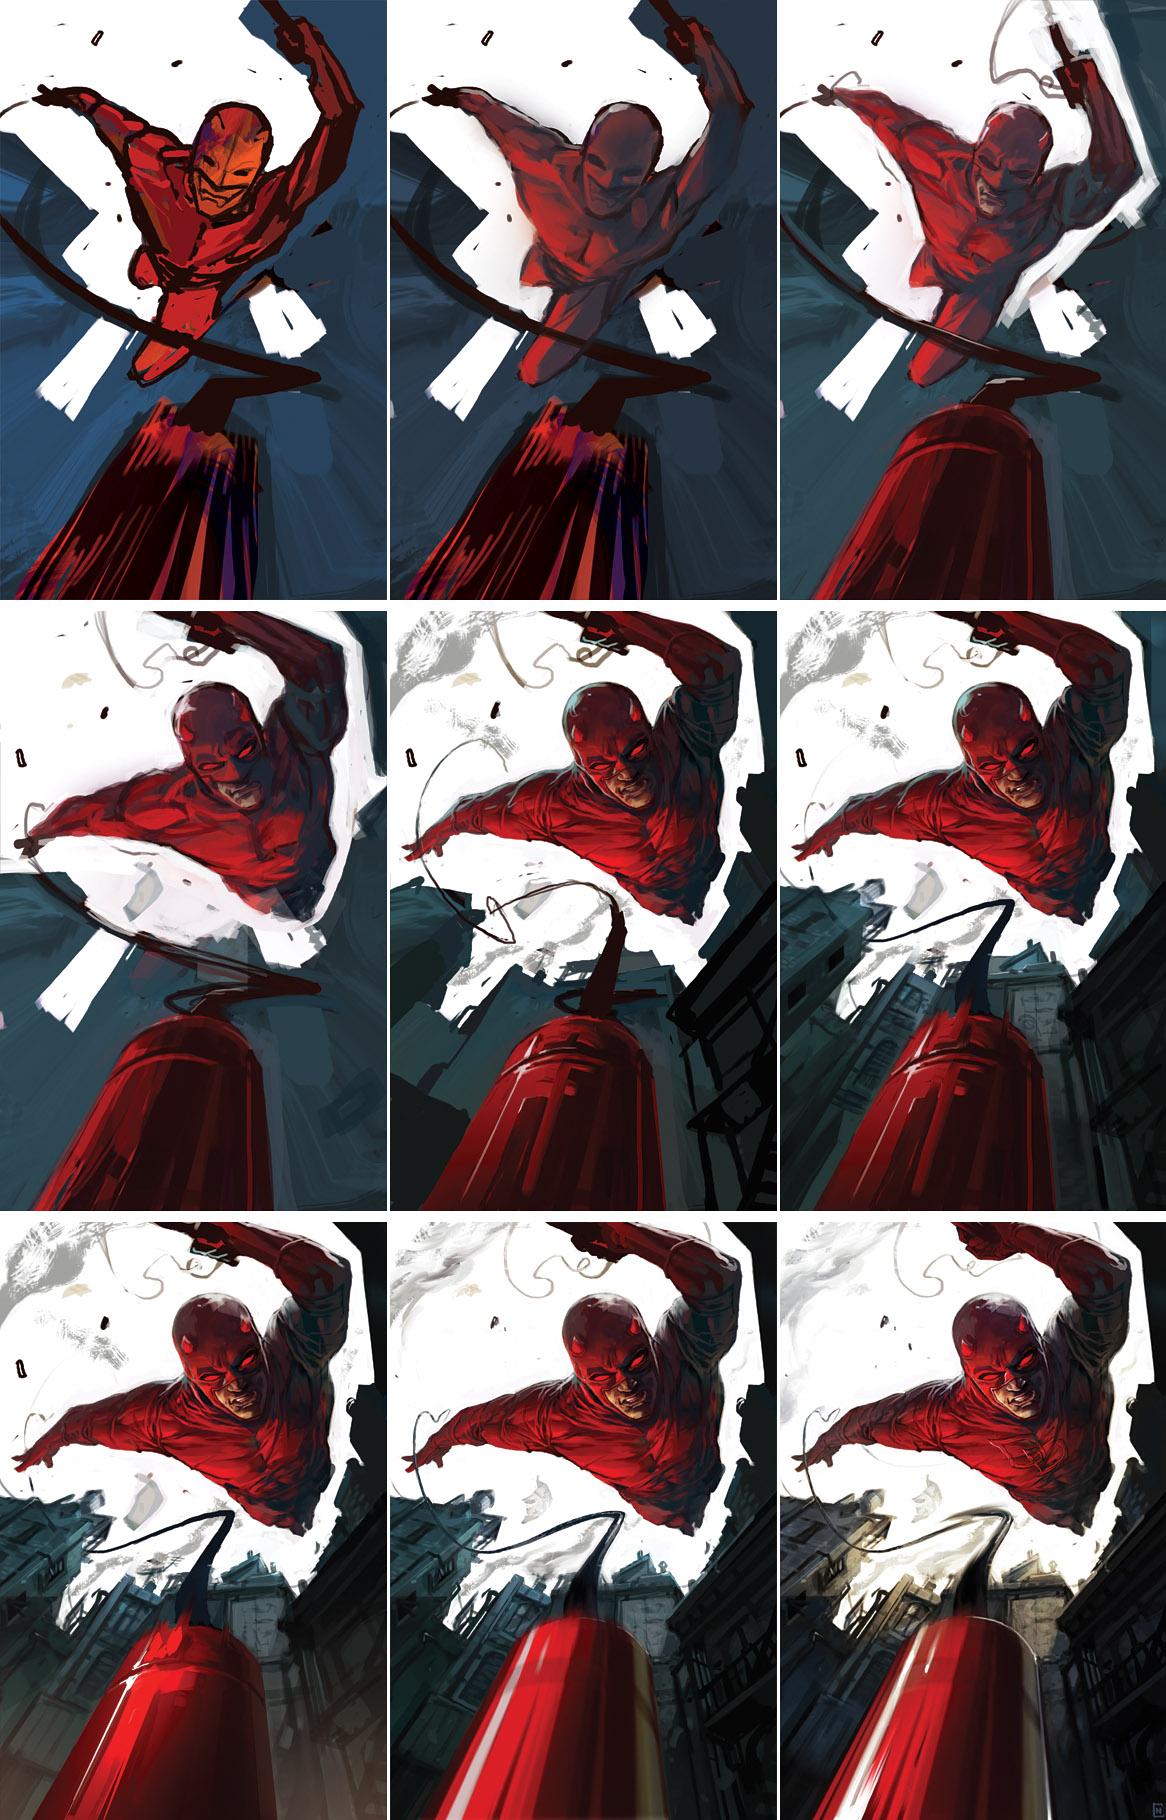 Daredevil walkthrough by ChristianNauck